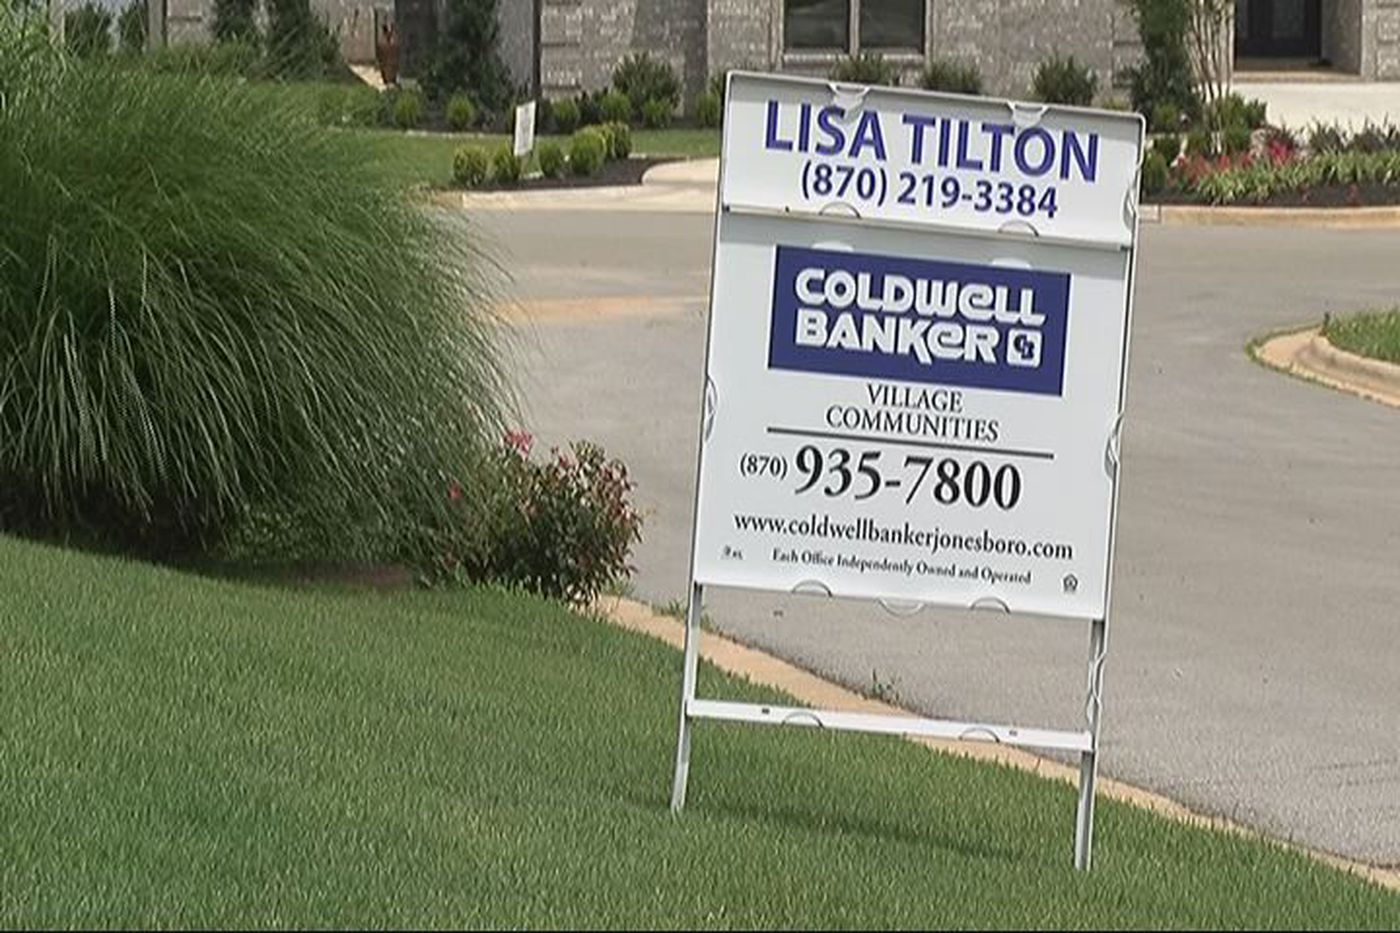 Craigslist home rental scam targets Jonesboro family